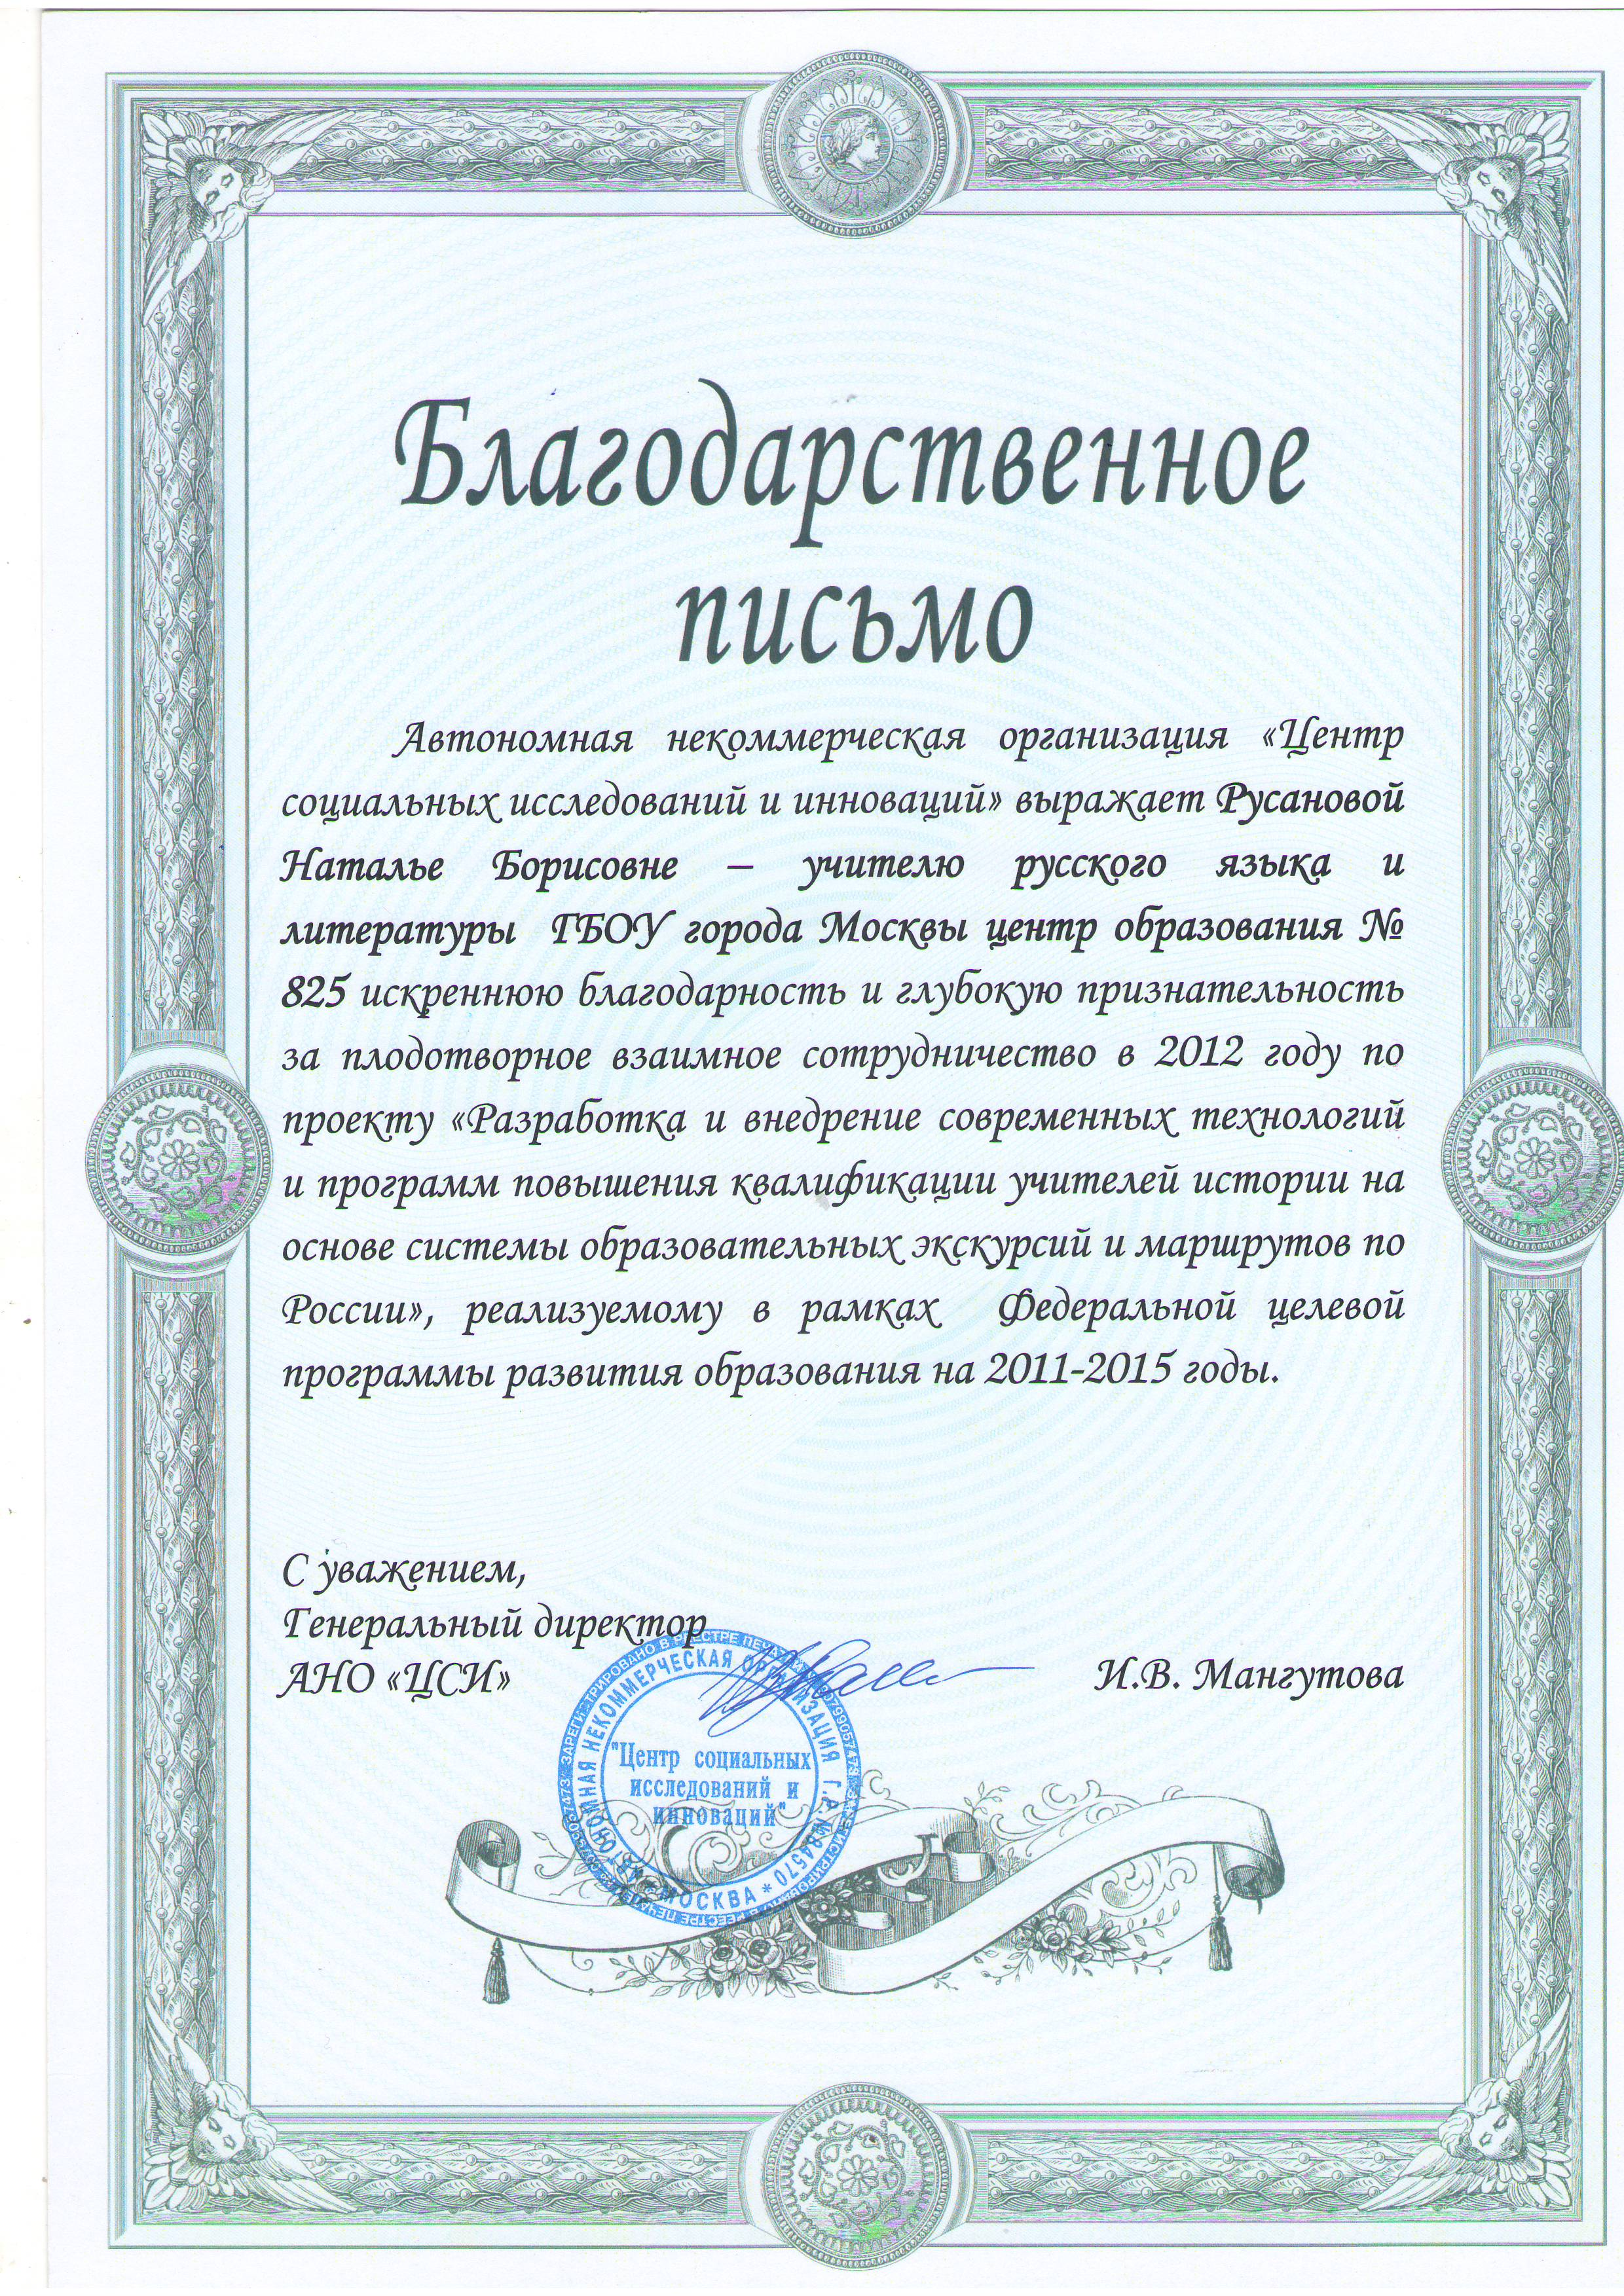 blagodarnost-2012